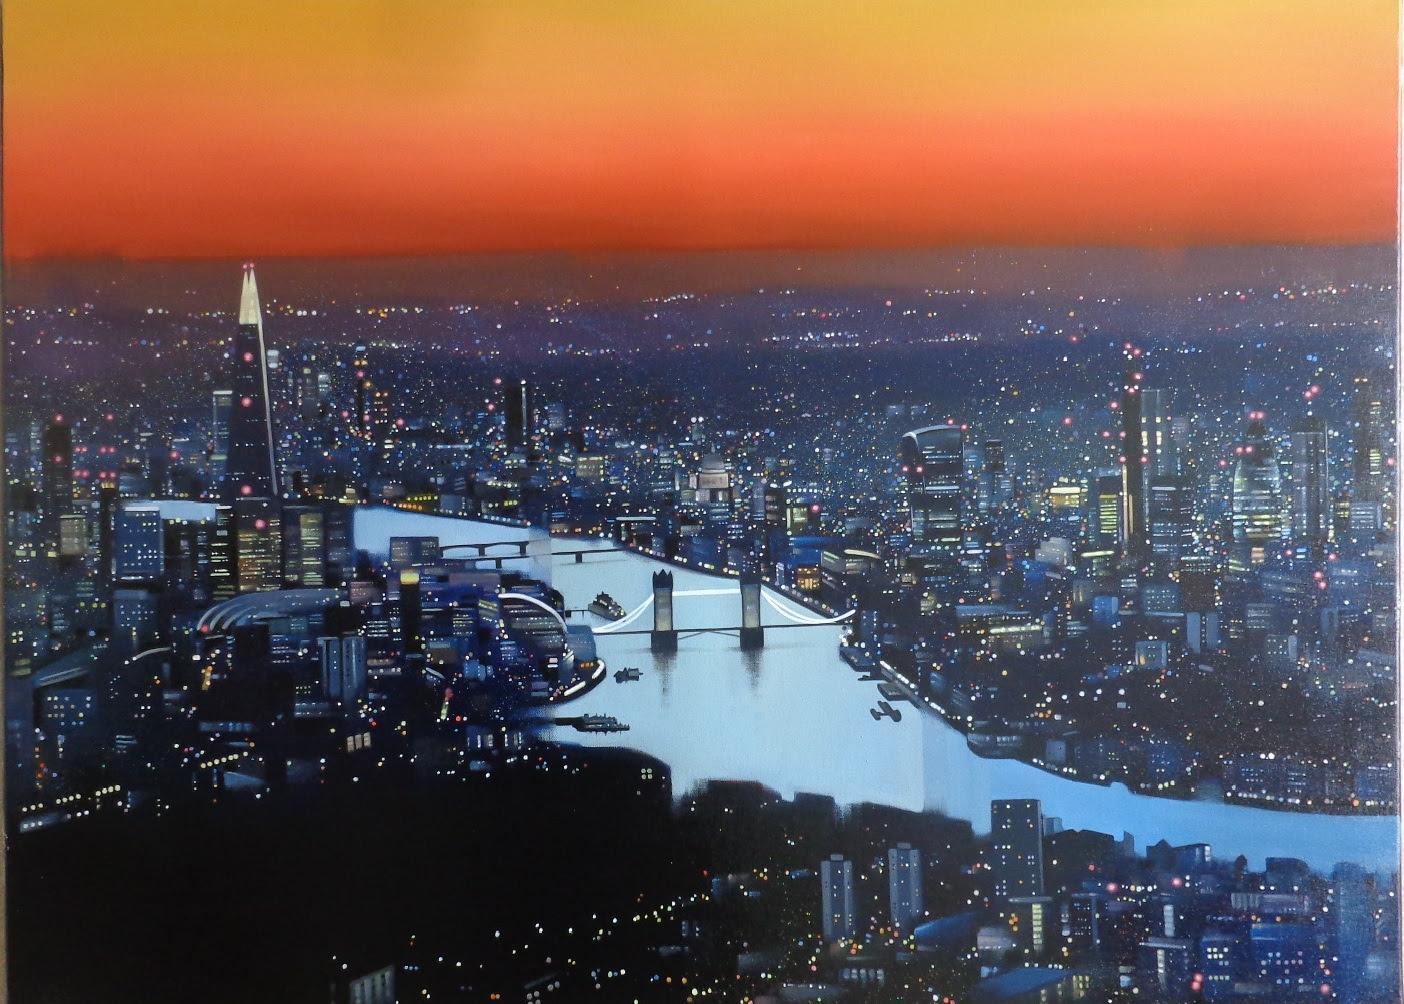 London Lights by Neil Dawson